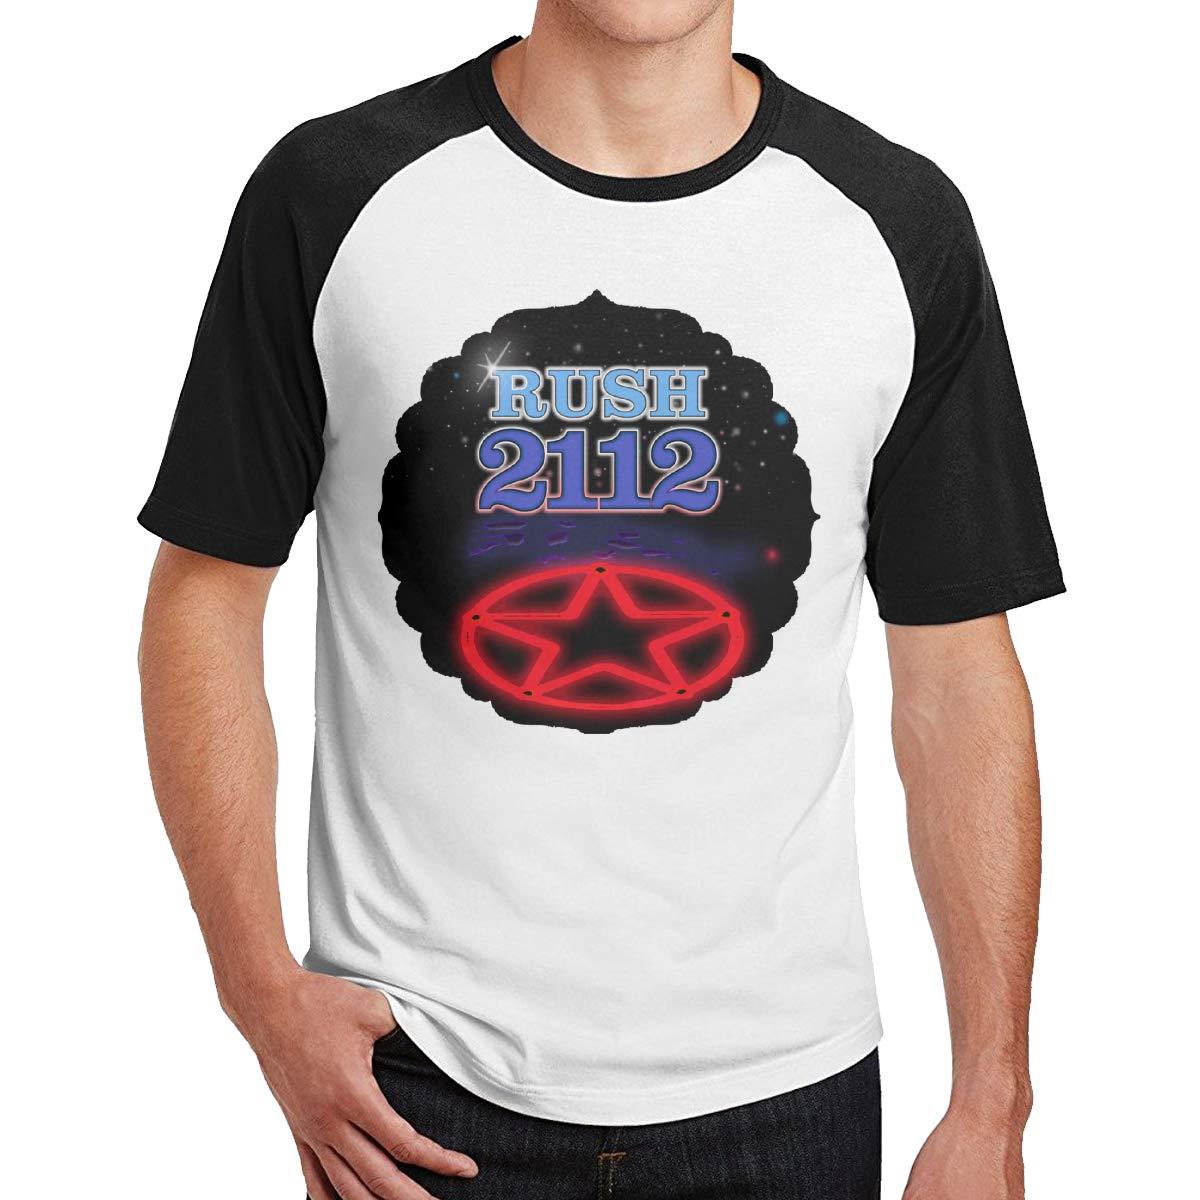 Bloonmer Mens Comfortable Rush 2112 Short Sleeve T-Shirts